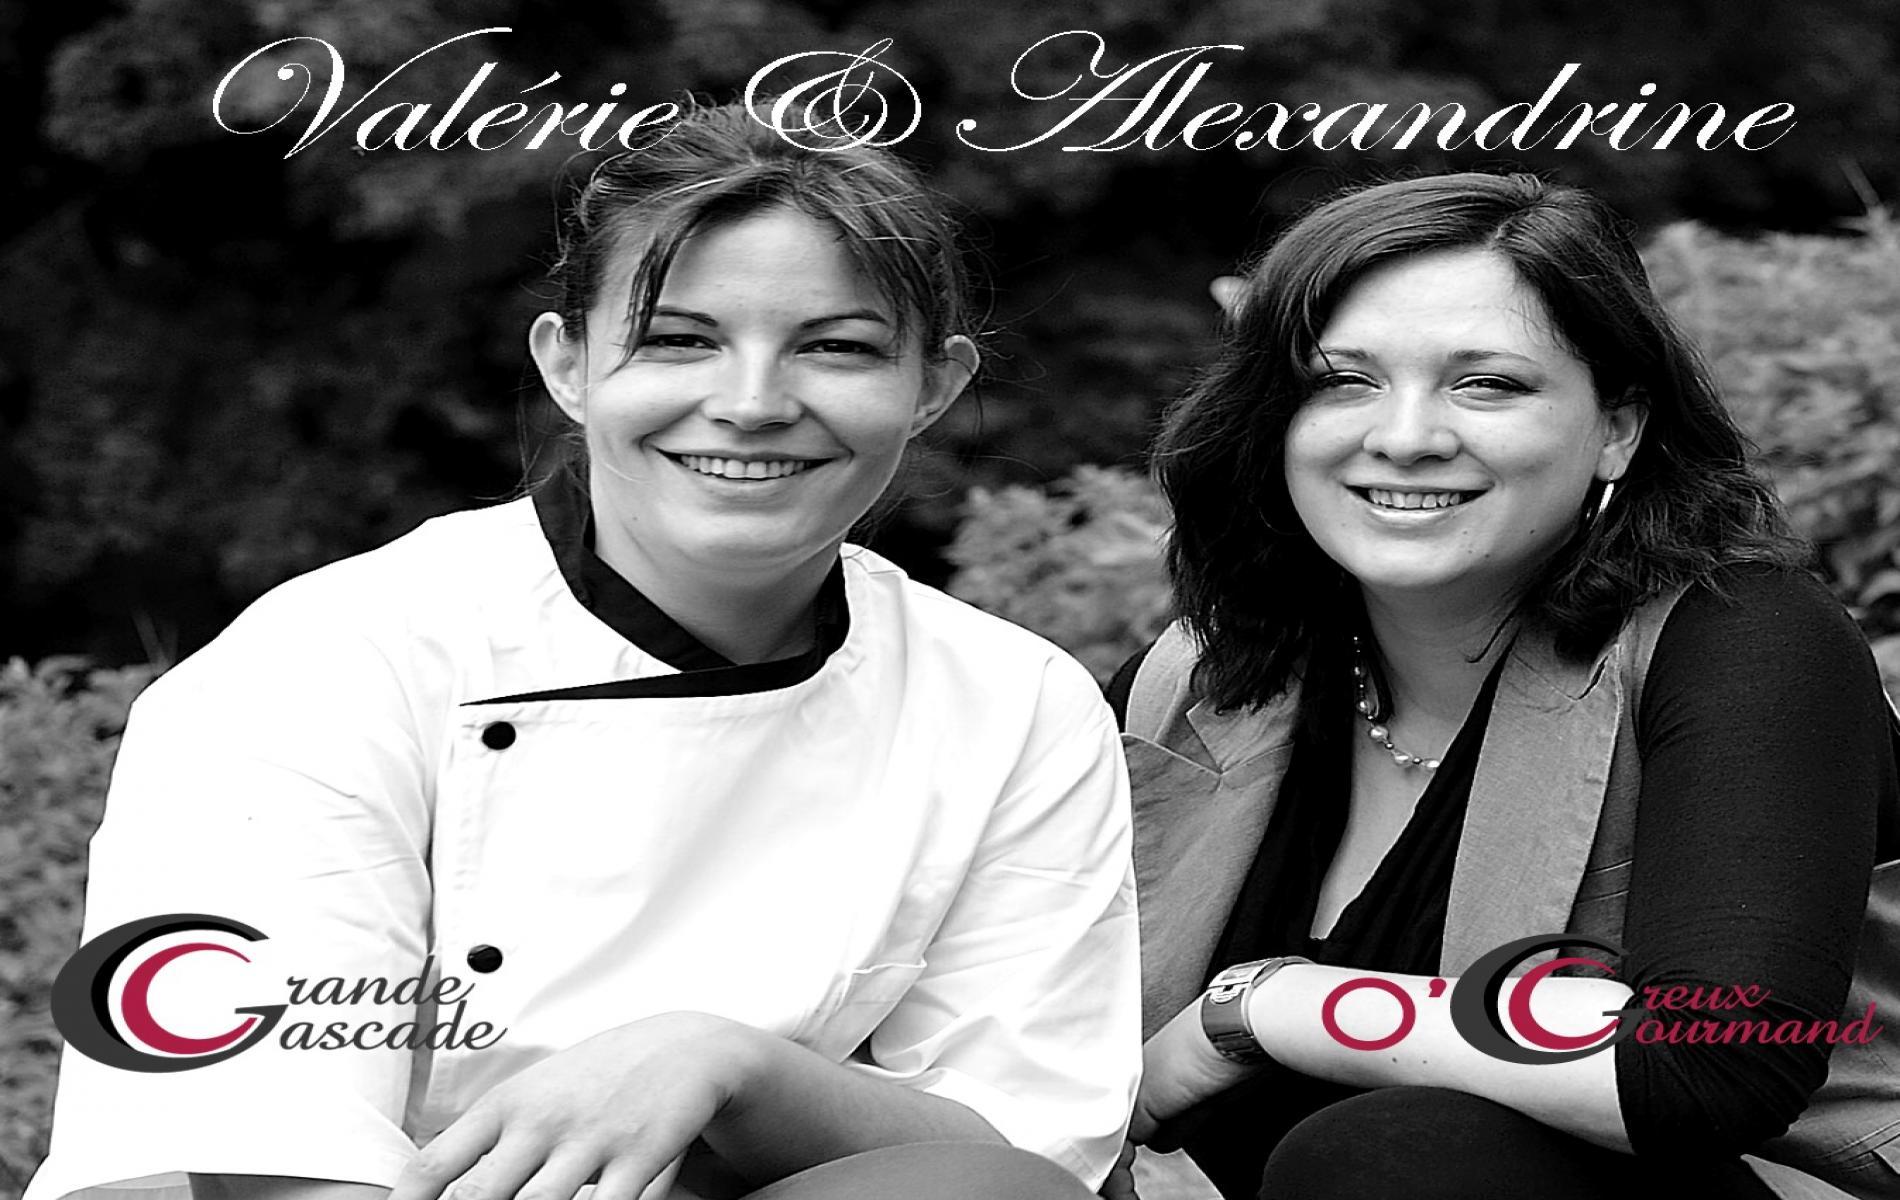 5eme génération Valérie et Alexandrine